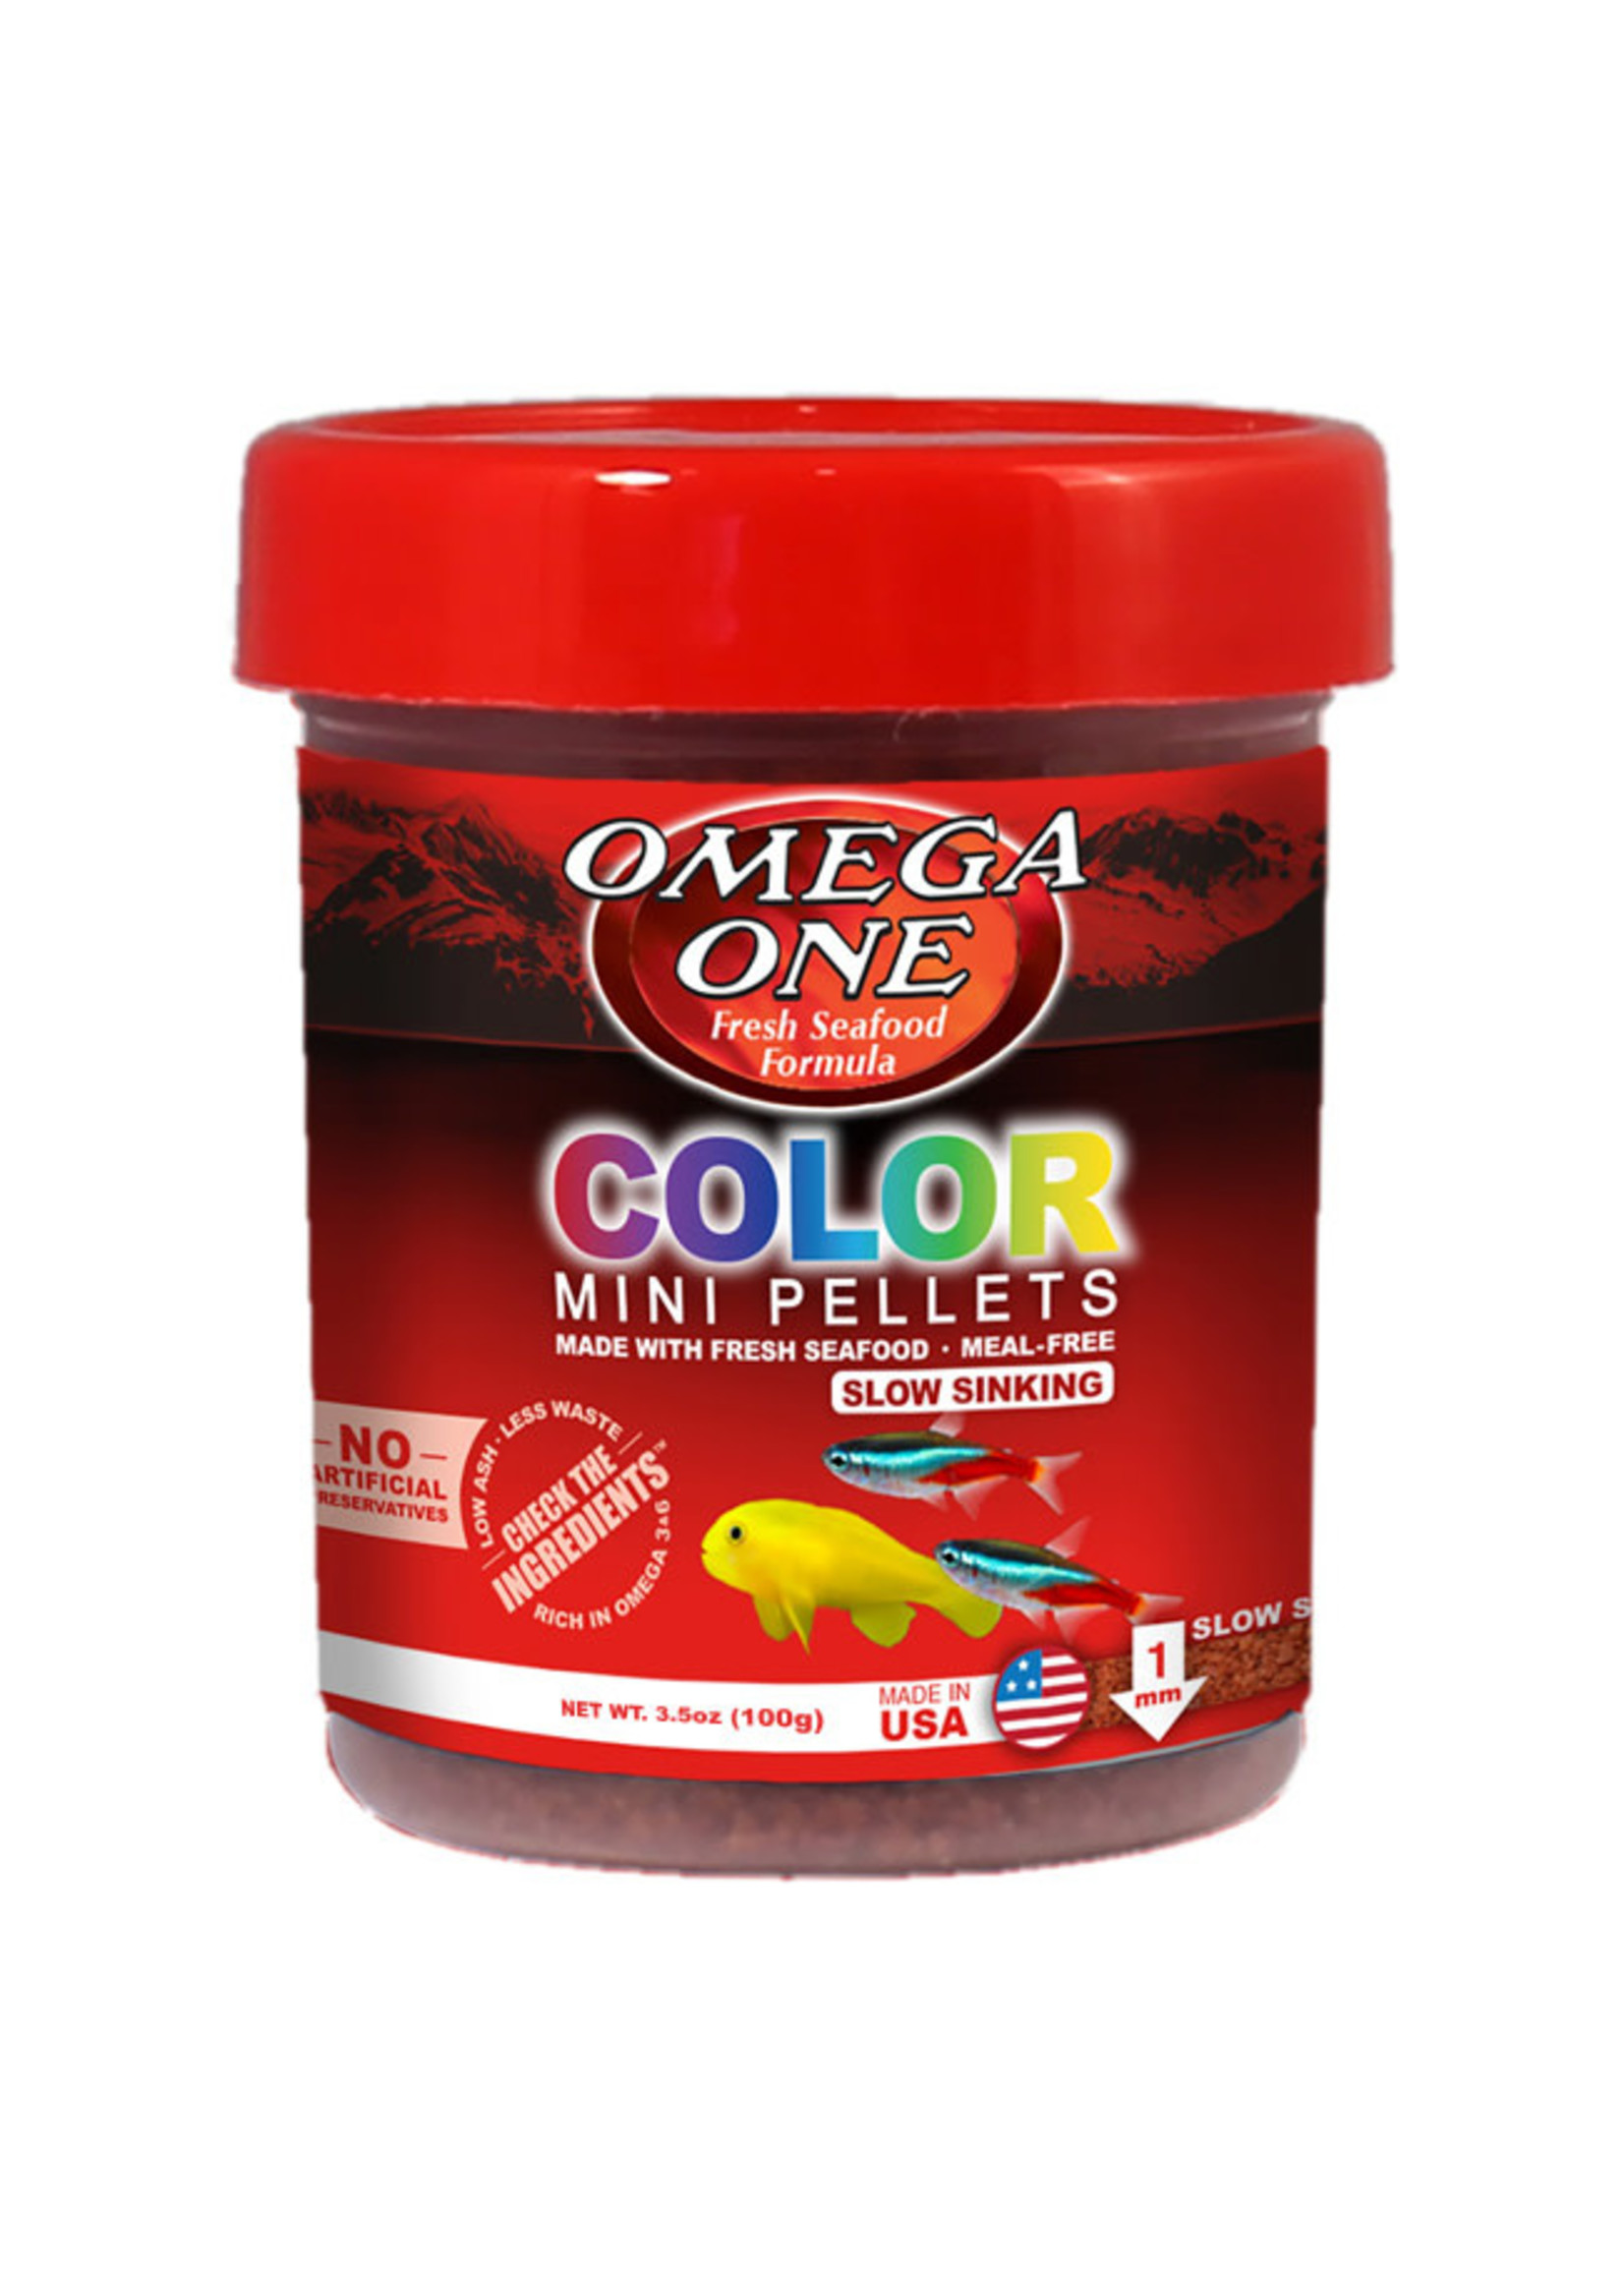 Omega One Omega One Color Sinking Mini Pellets